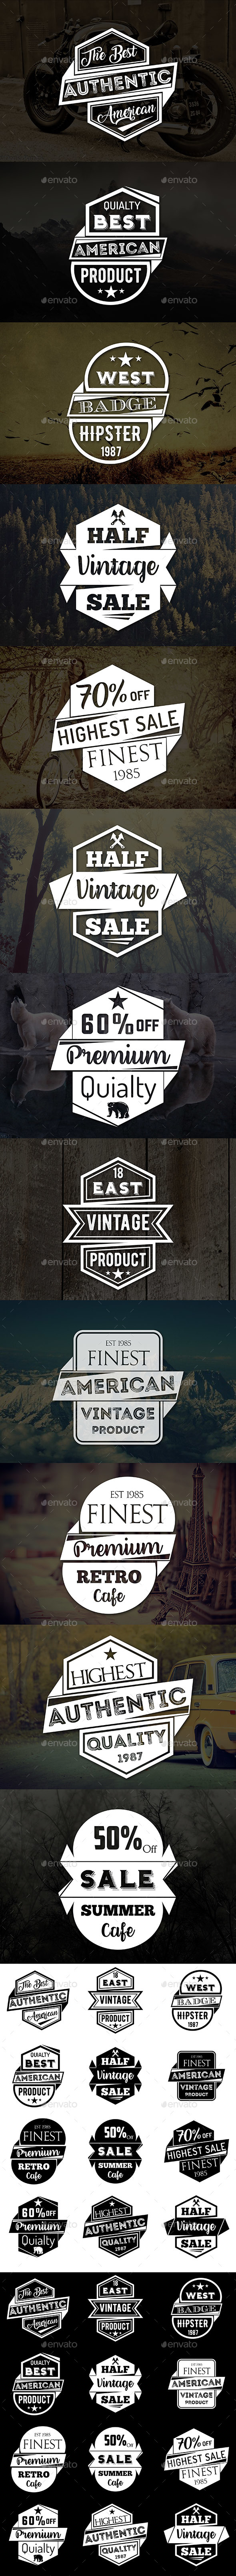 GraphicRiver Vintage Badges & Logos 20496885